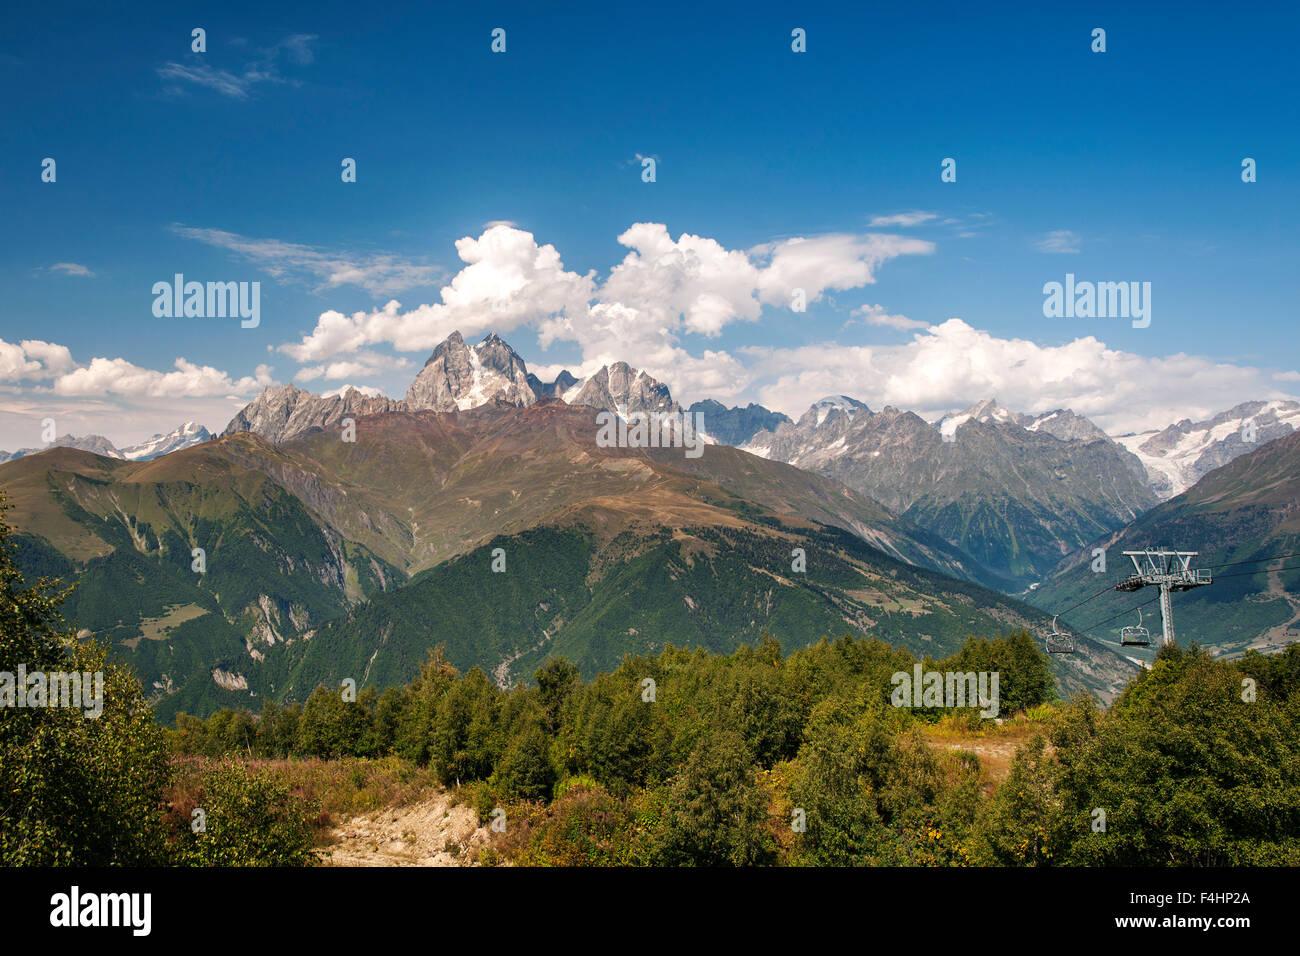 The twin peaks of Mount Ushba (4710m) and the ski lift of Hatsvali ski station in the Svaneti region of northwestern - Stock Image